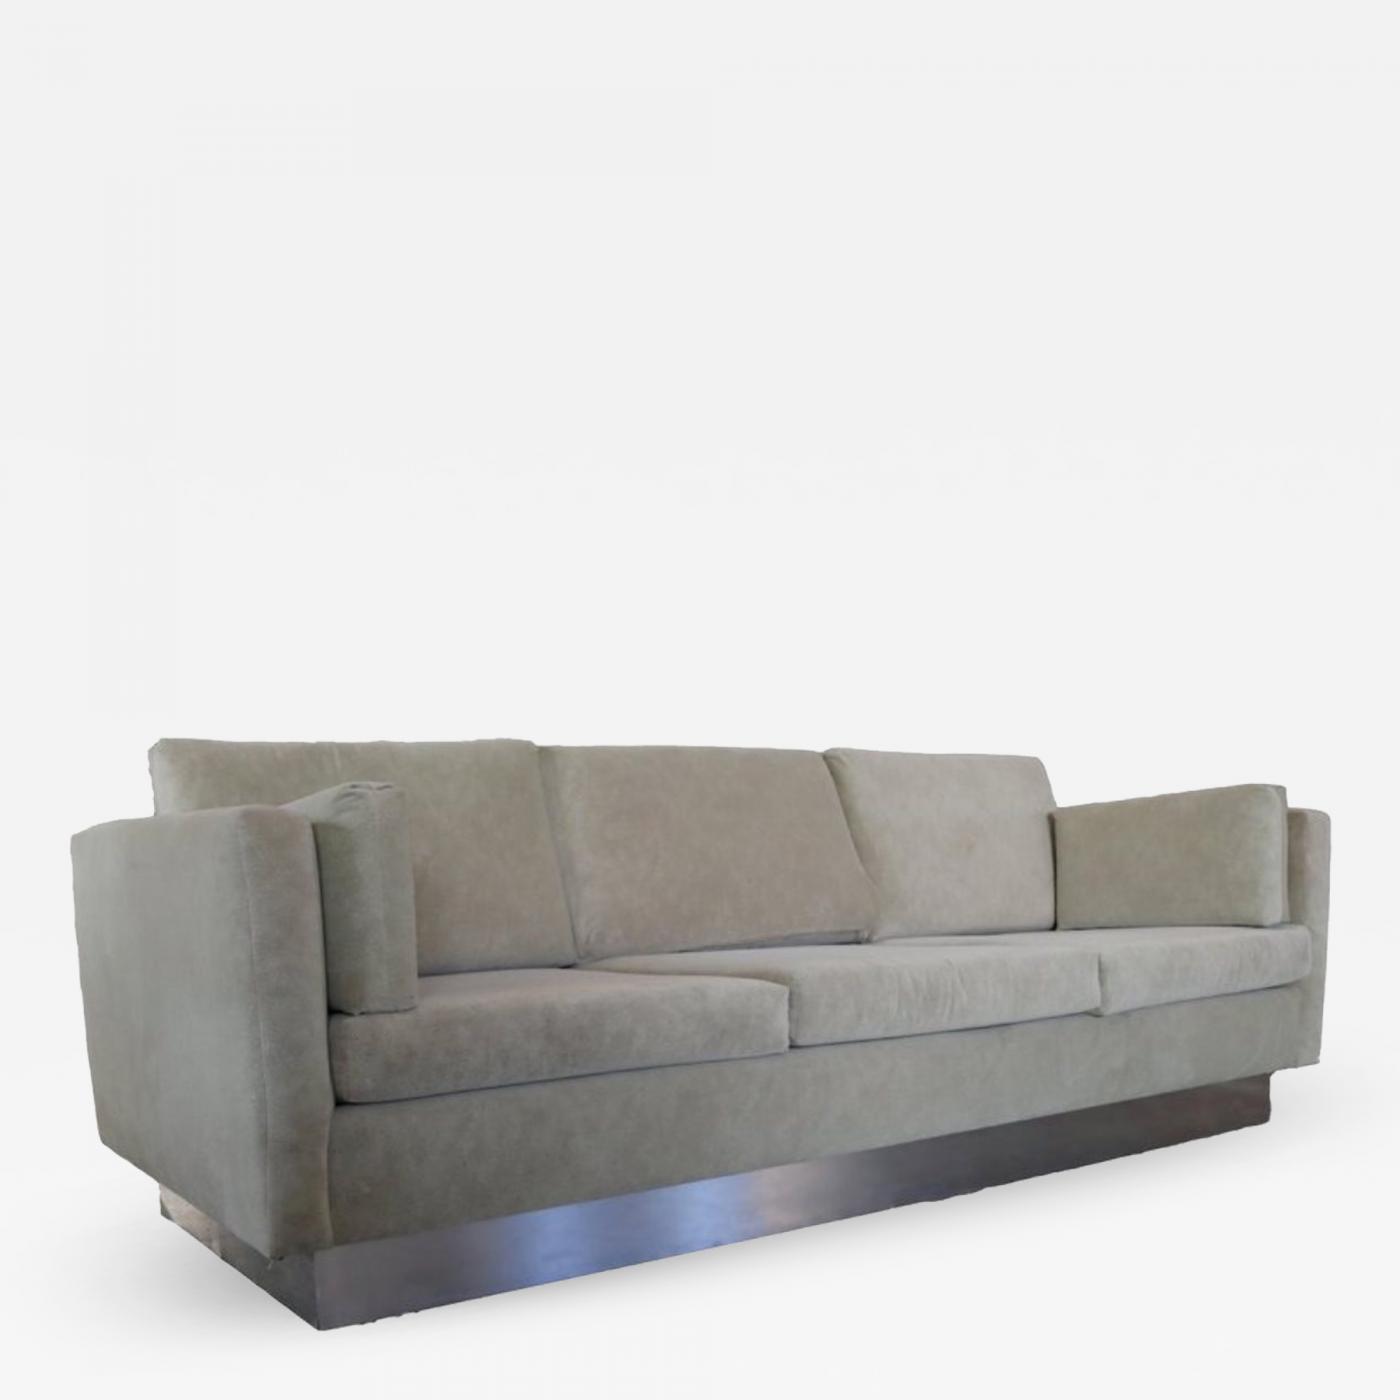 Listings / Furniture / Seating / Sofas · Milo Baughman Tuxedo Sofa In Milo  Baughman Style